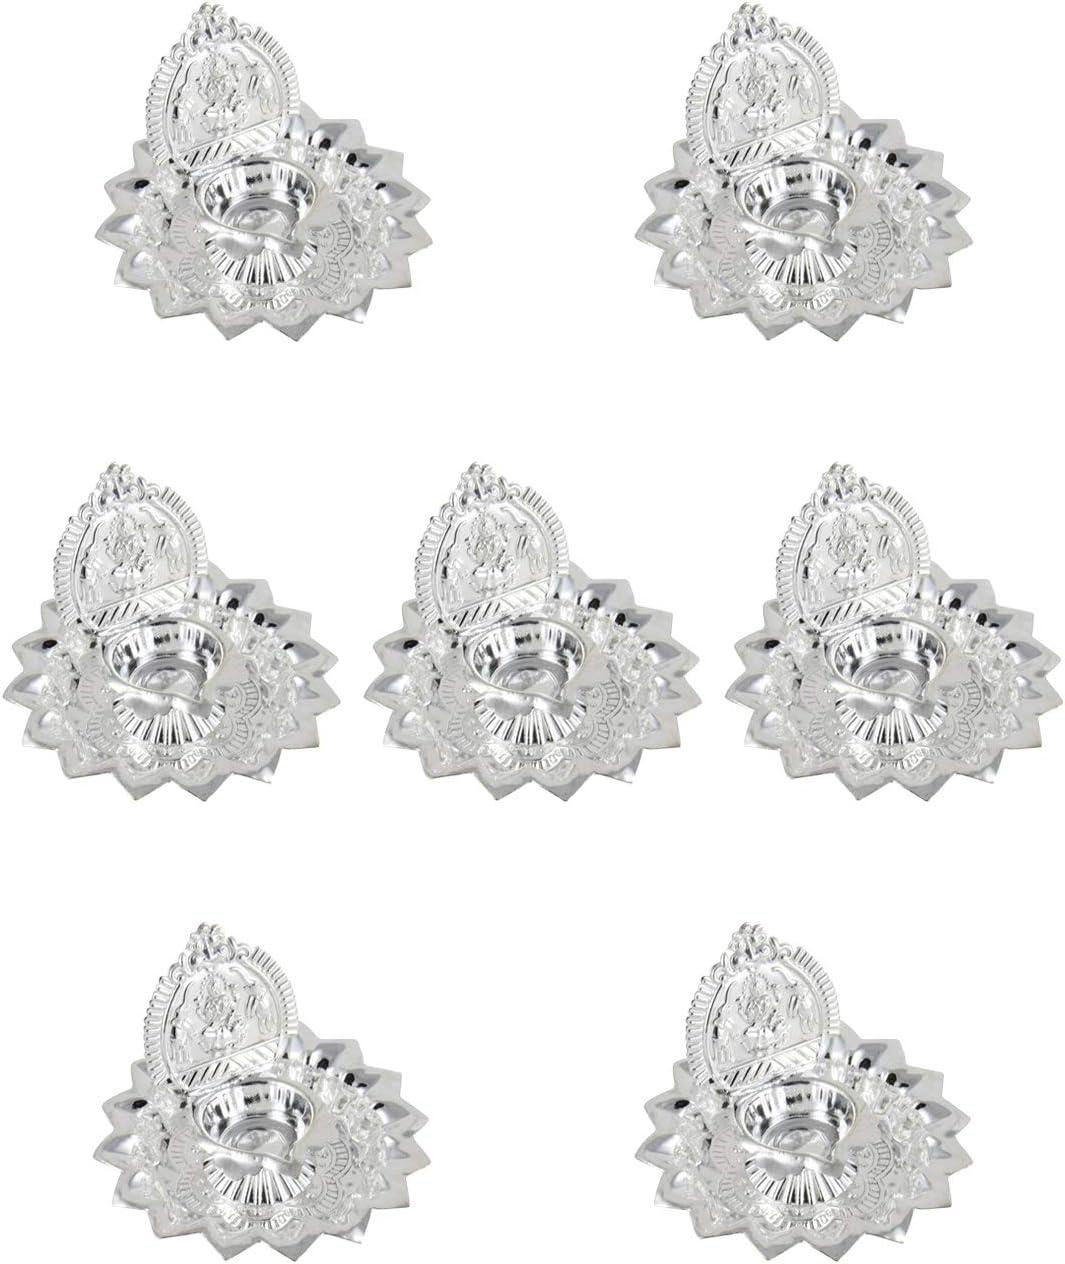 GoldGiftIdeas Silver Plated Gaj Lakshmi Diya Pooja Thali Set, Decorative Diya for Pooja, Indian Pooja Items for Gift, Home Decor Return Gift for Housewarming with Potli Bags (7)